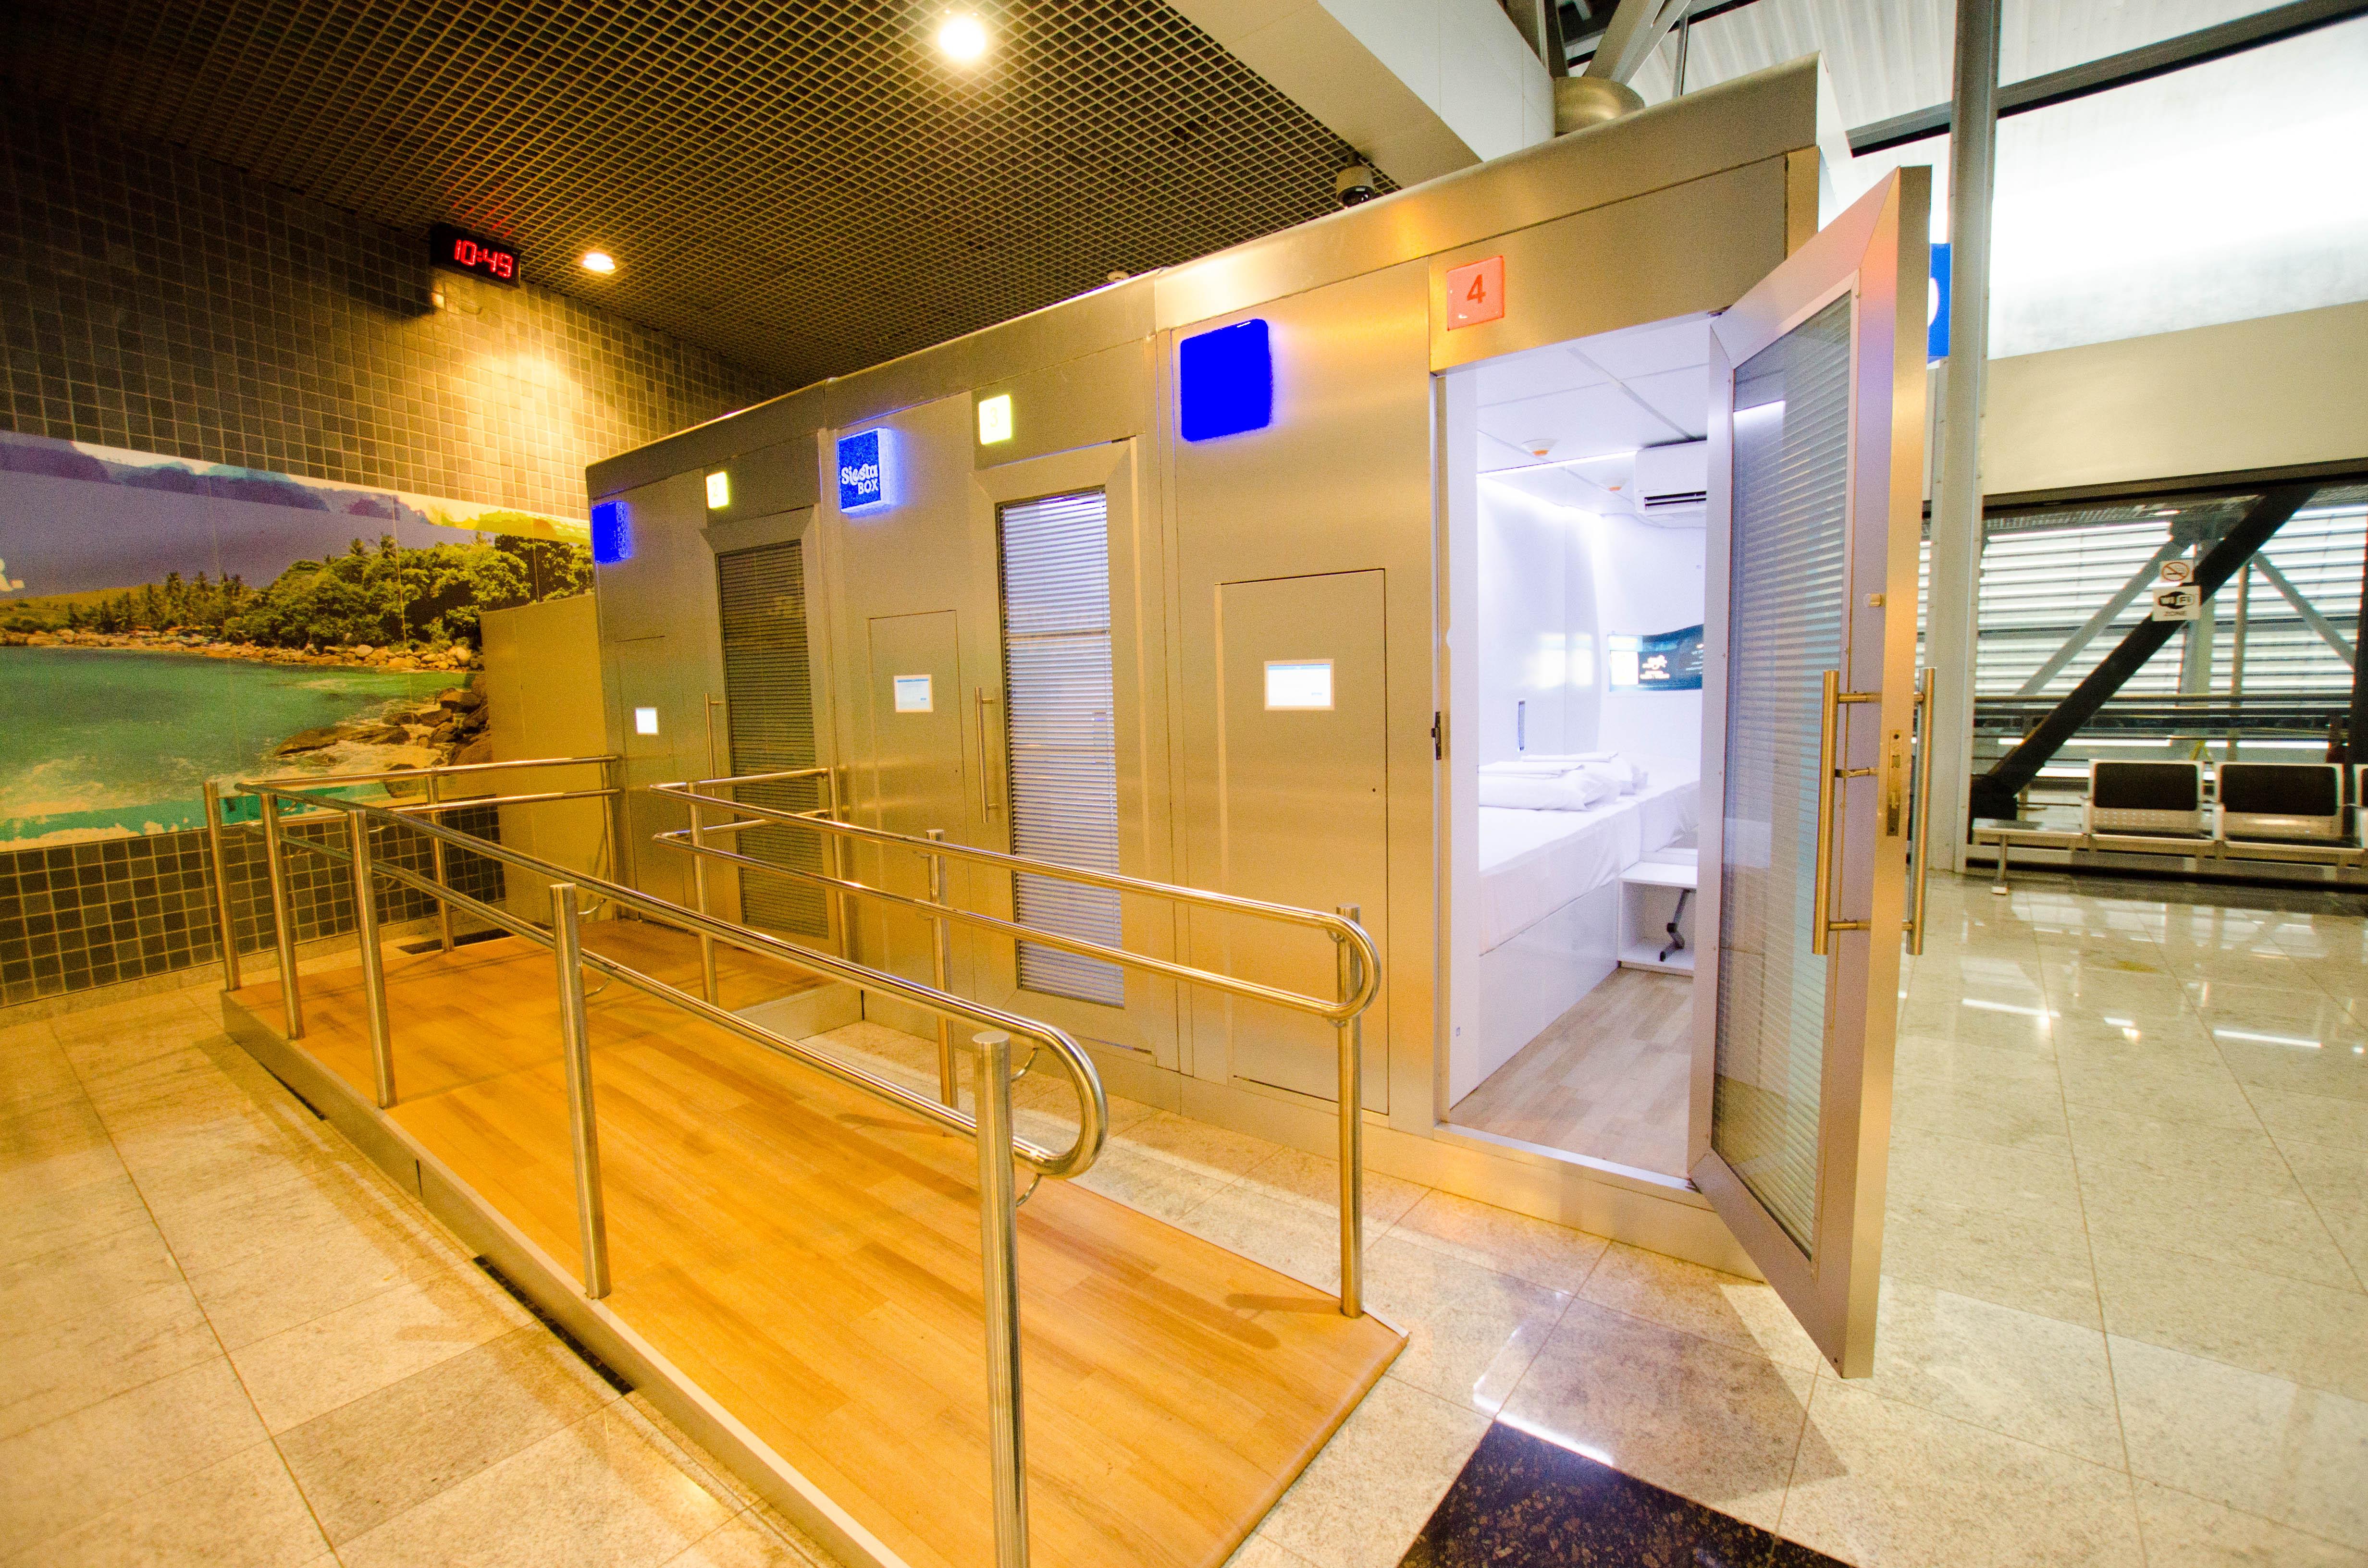 Aeroporto De Recife Tem Cabine De Descanso Automatizada Por R 50 A